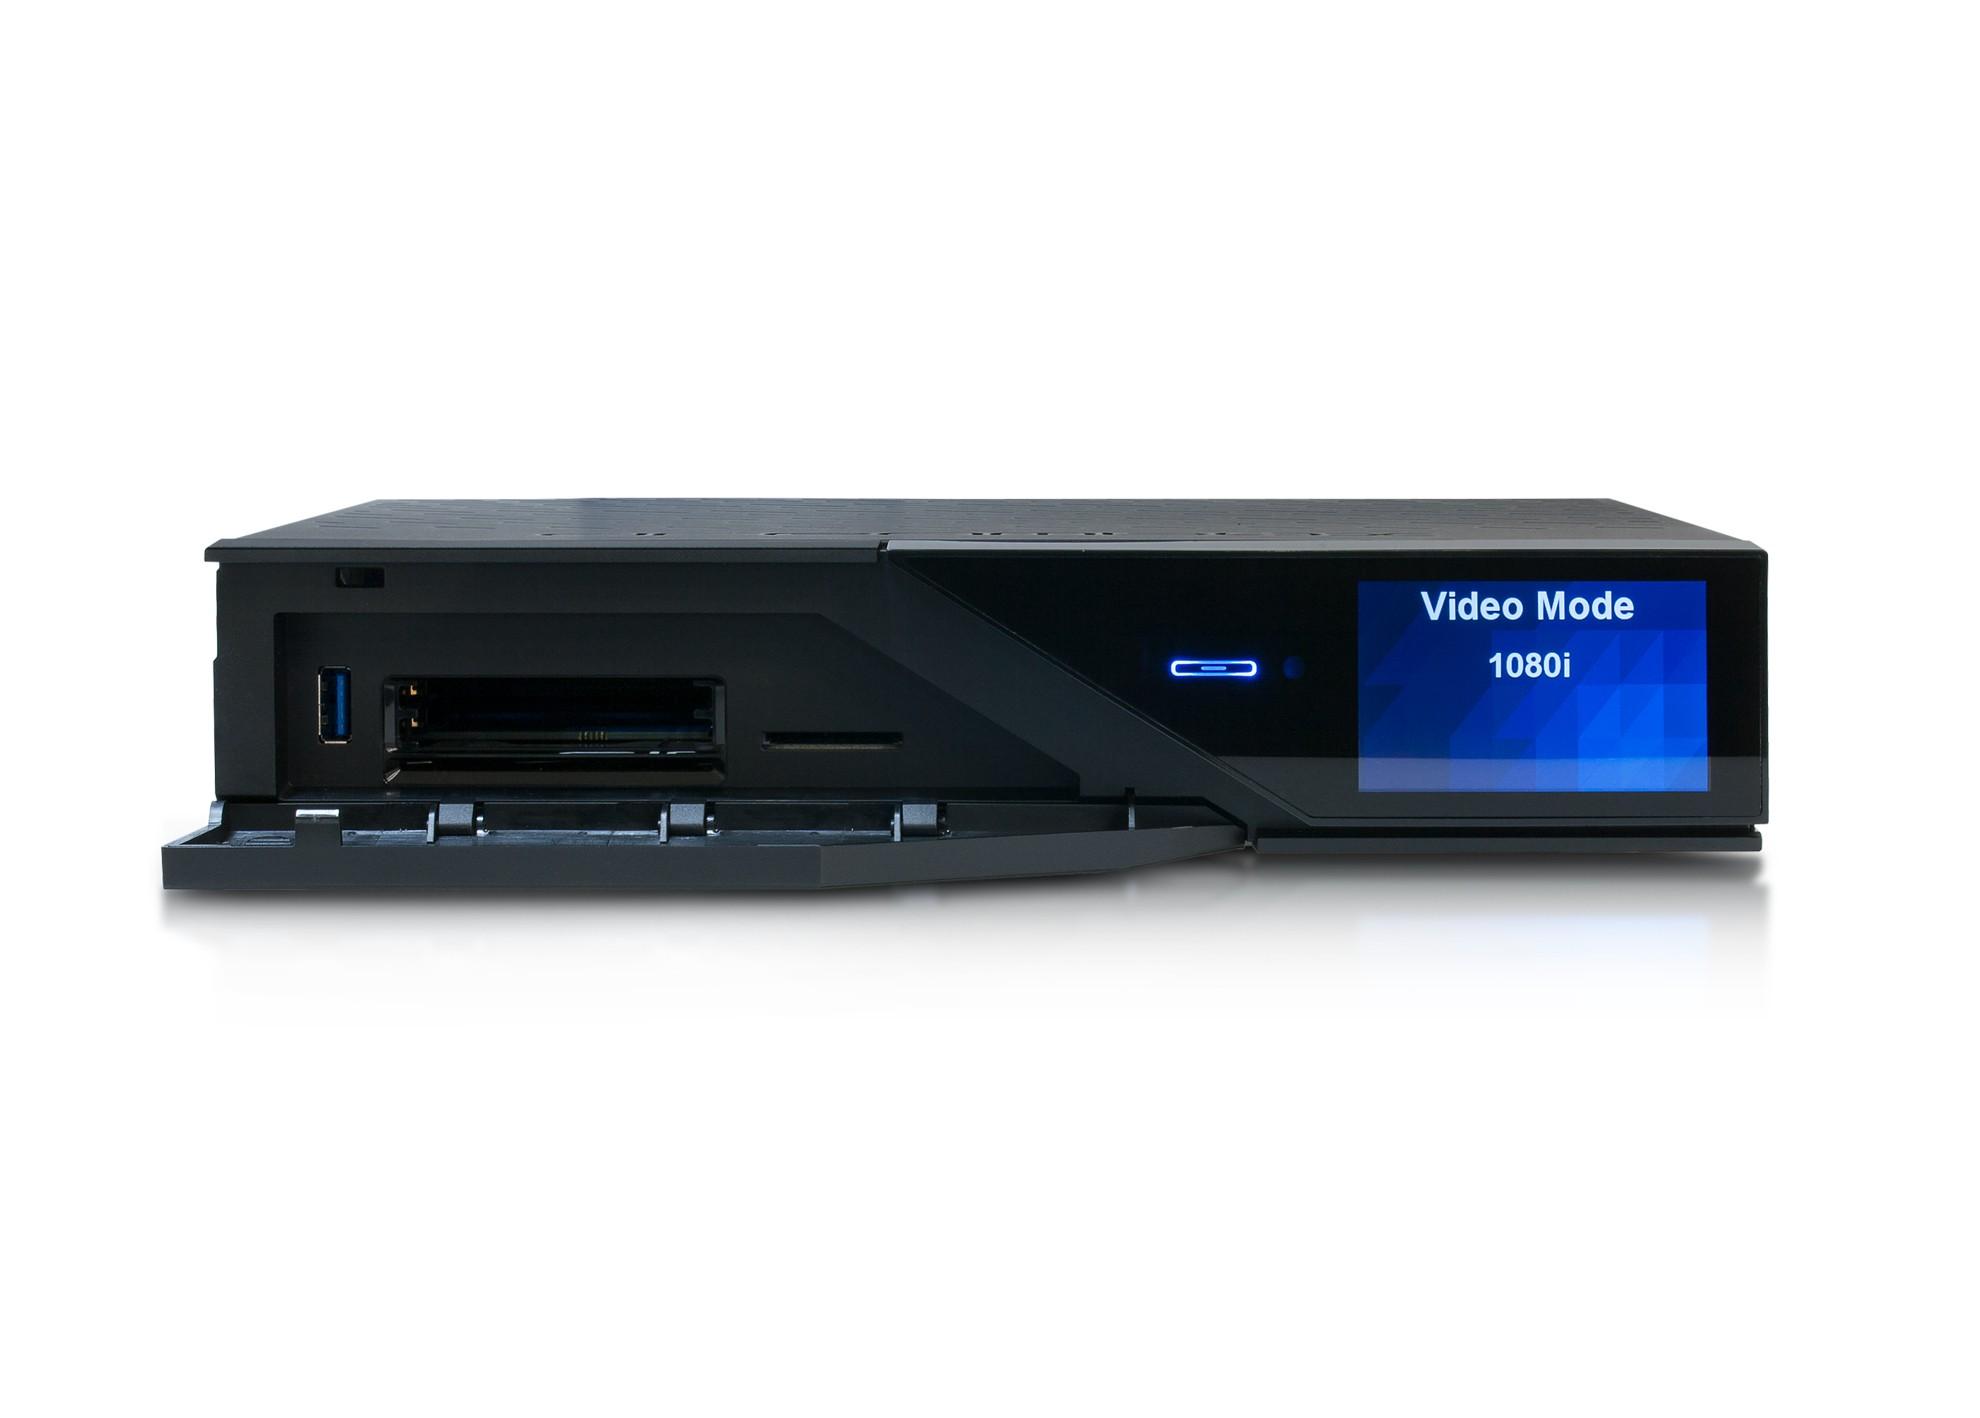 Dreambox DM-920 UHD 4K MS (2x DVB-S2X, DVB-C/T2)